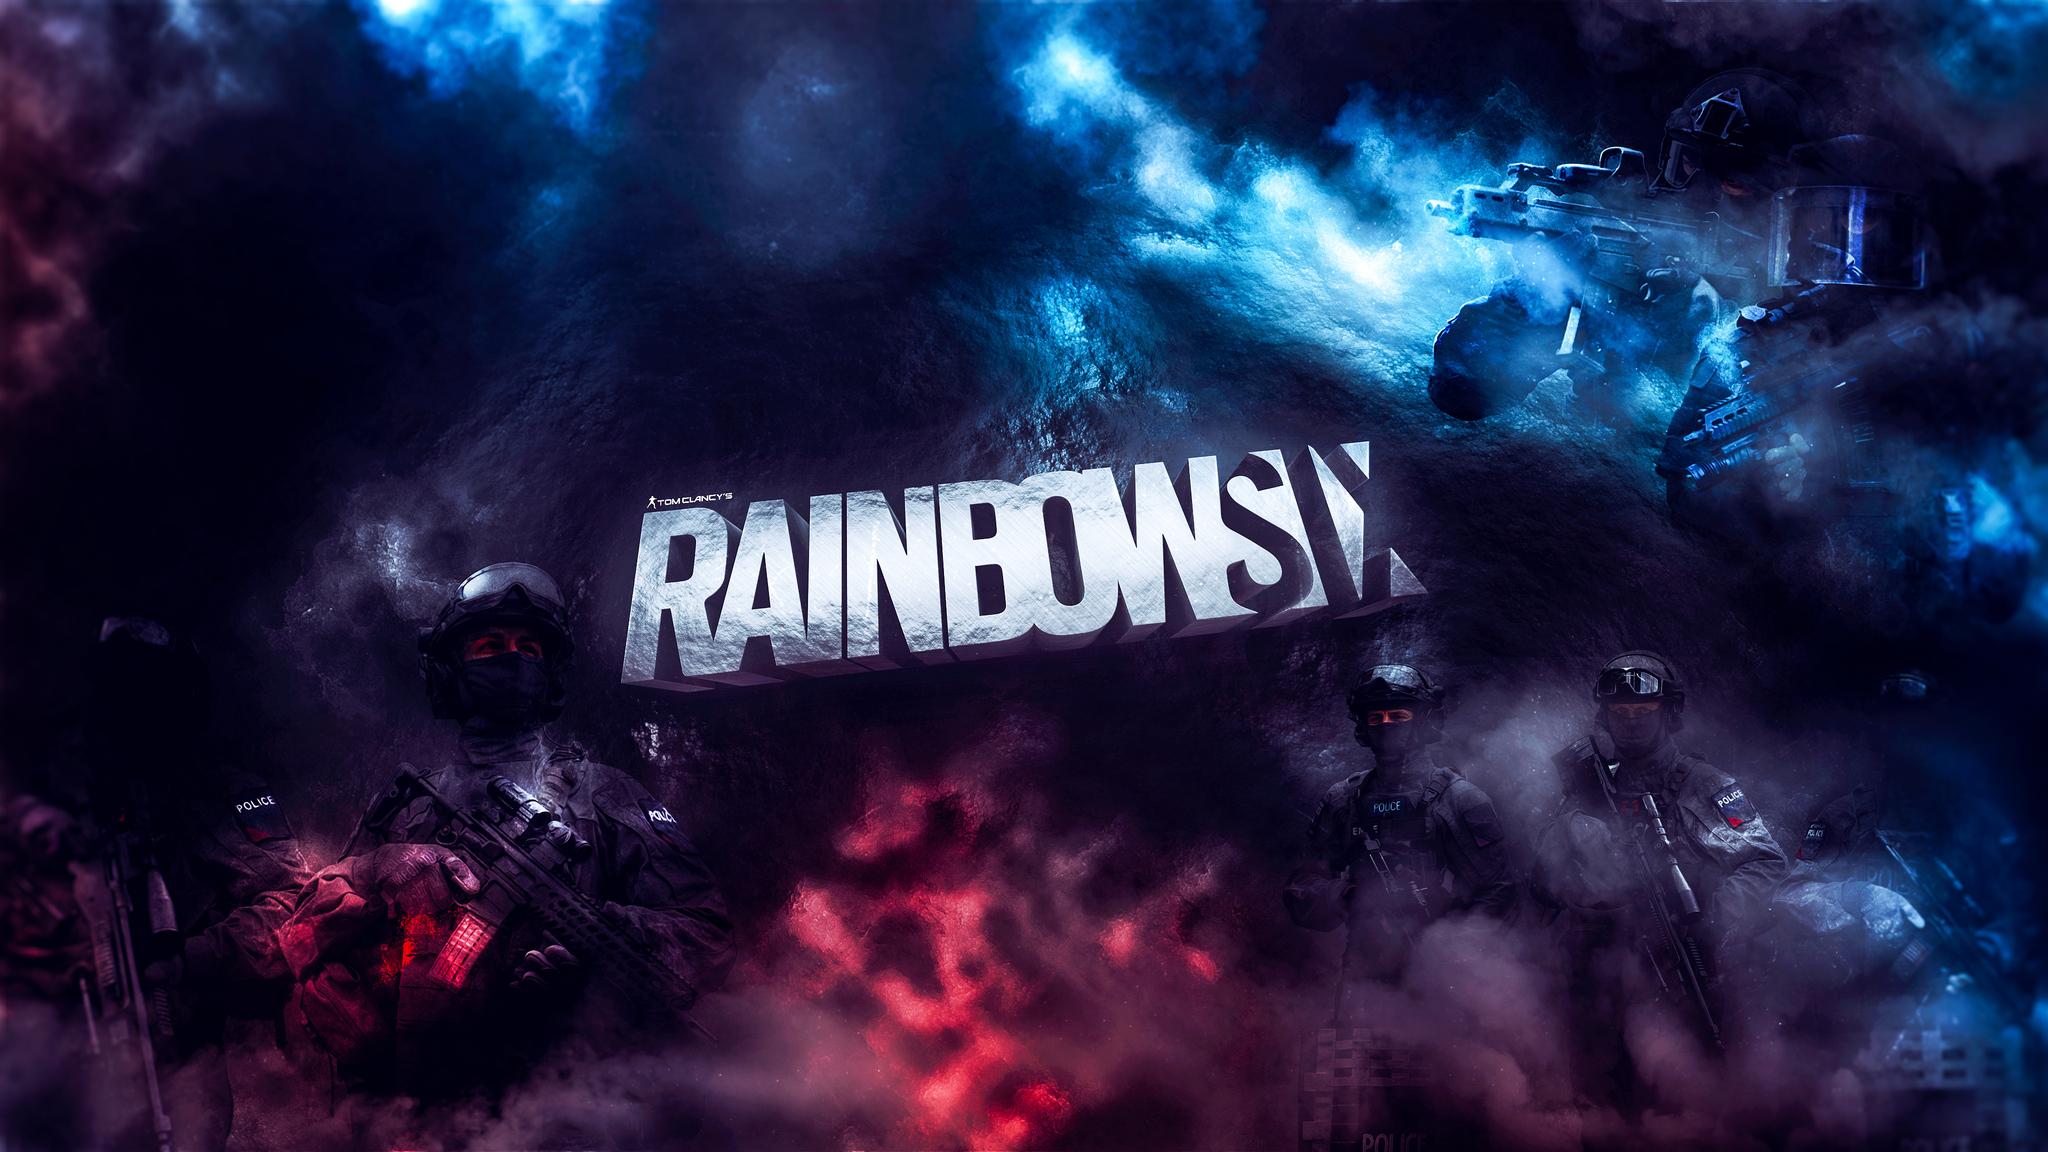 2048x1152 Rainbow Six Siege 4k Artwork 2048x1152 ...